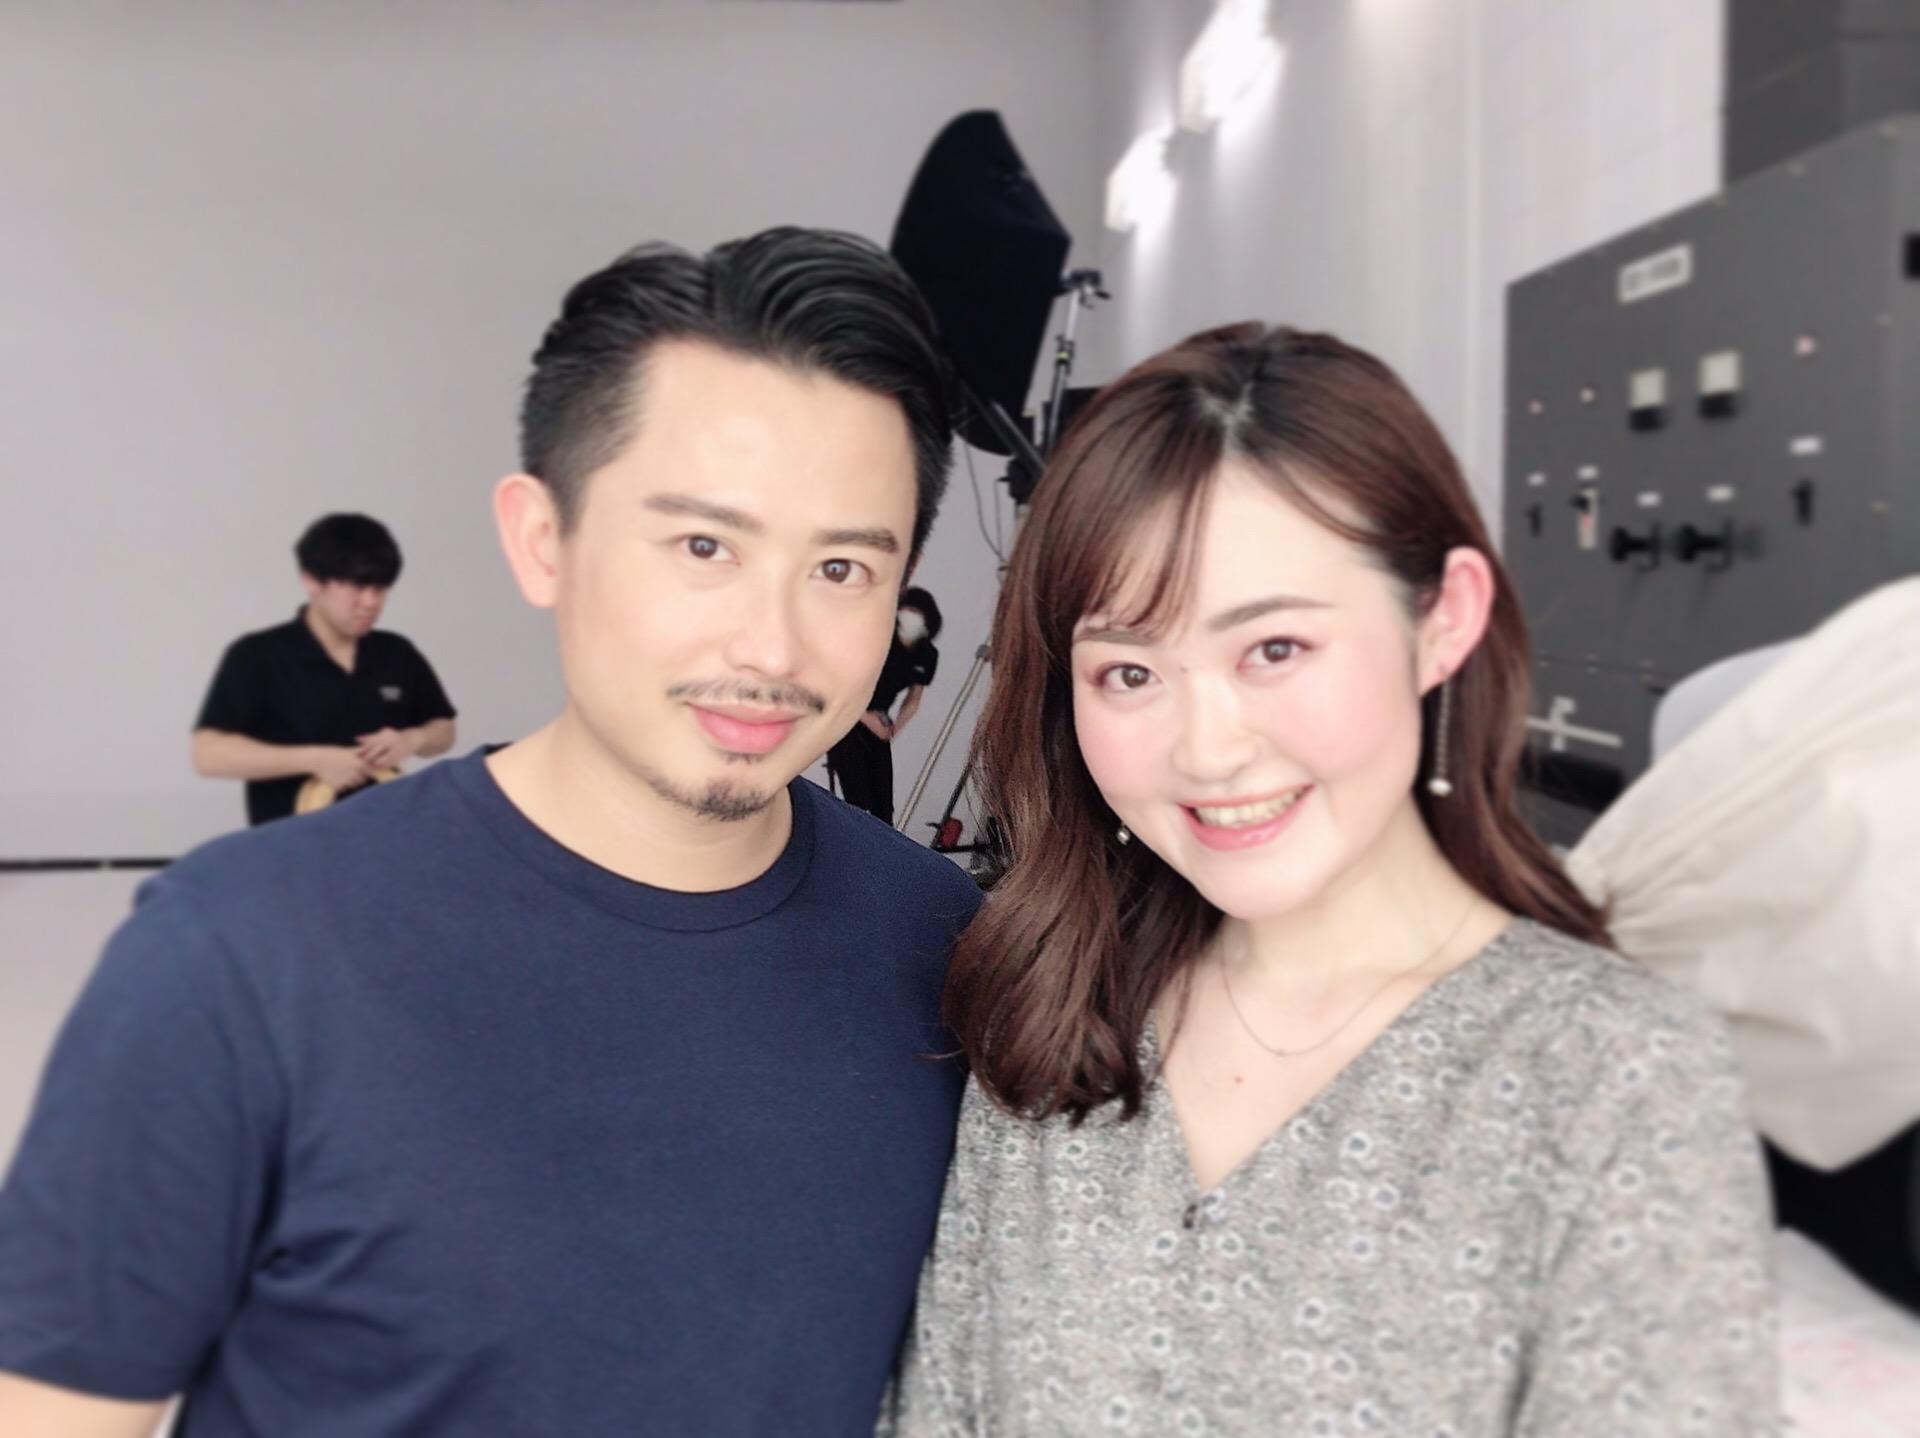 【MORE5月号】お仕事メイク特集!メイクアップアーティスト❁小田切ヒロさん❁直伝!眉メイクの教え。_1